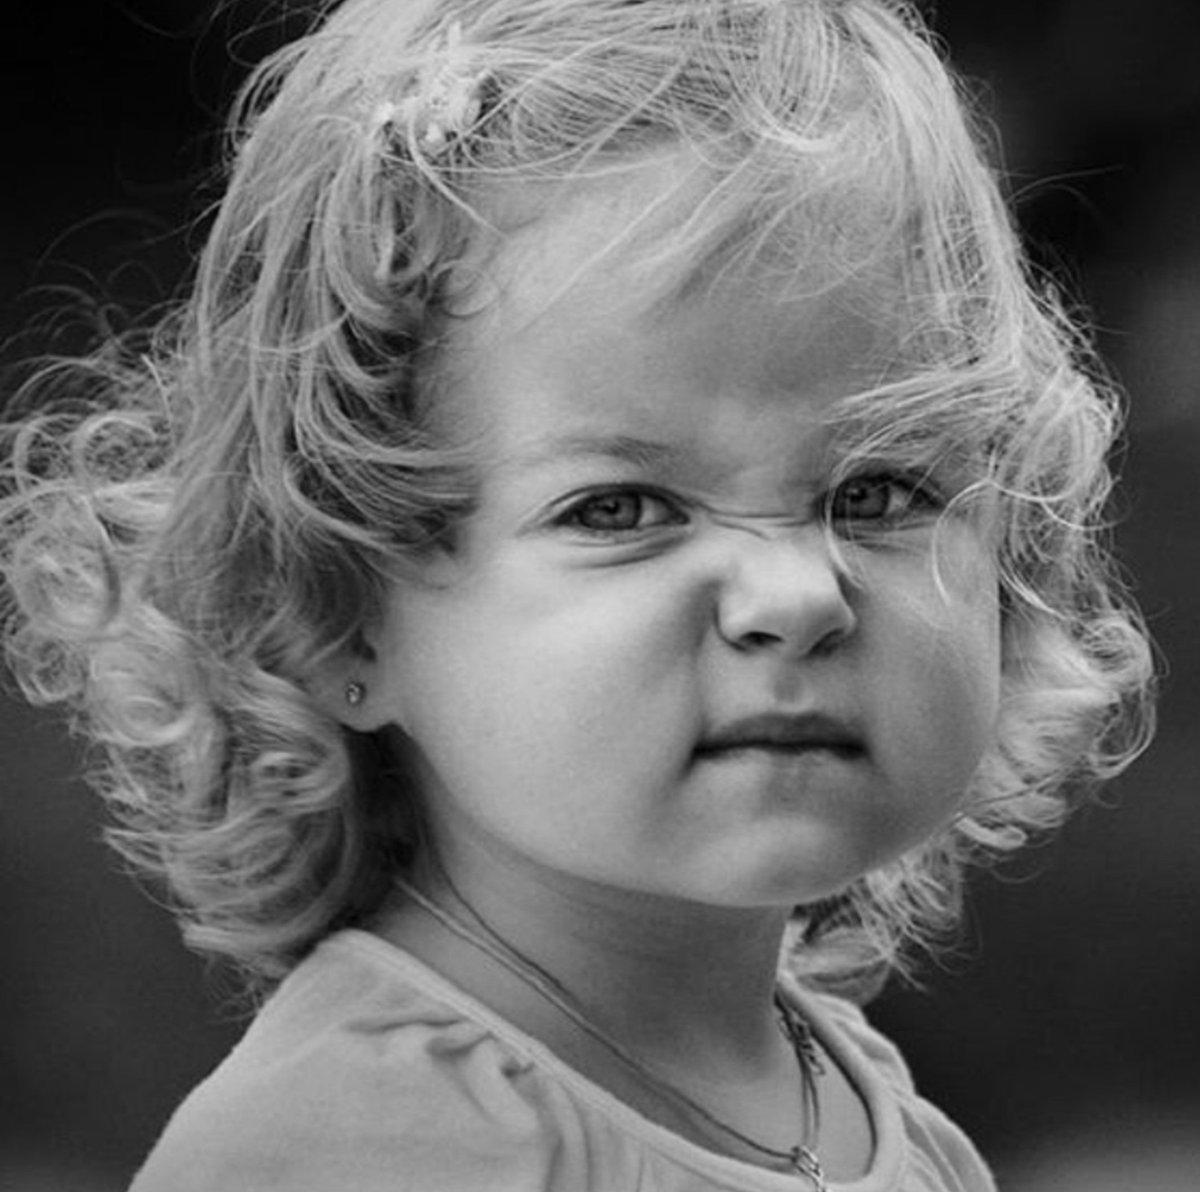 Картинка девочка злючка